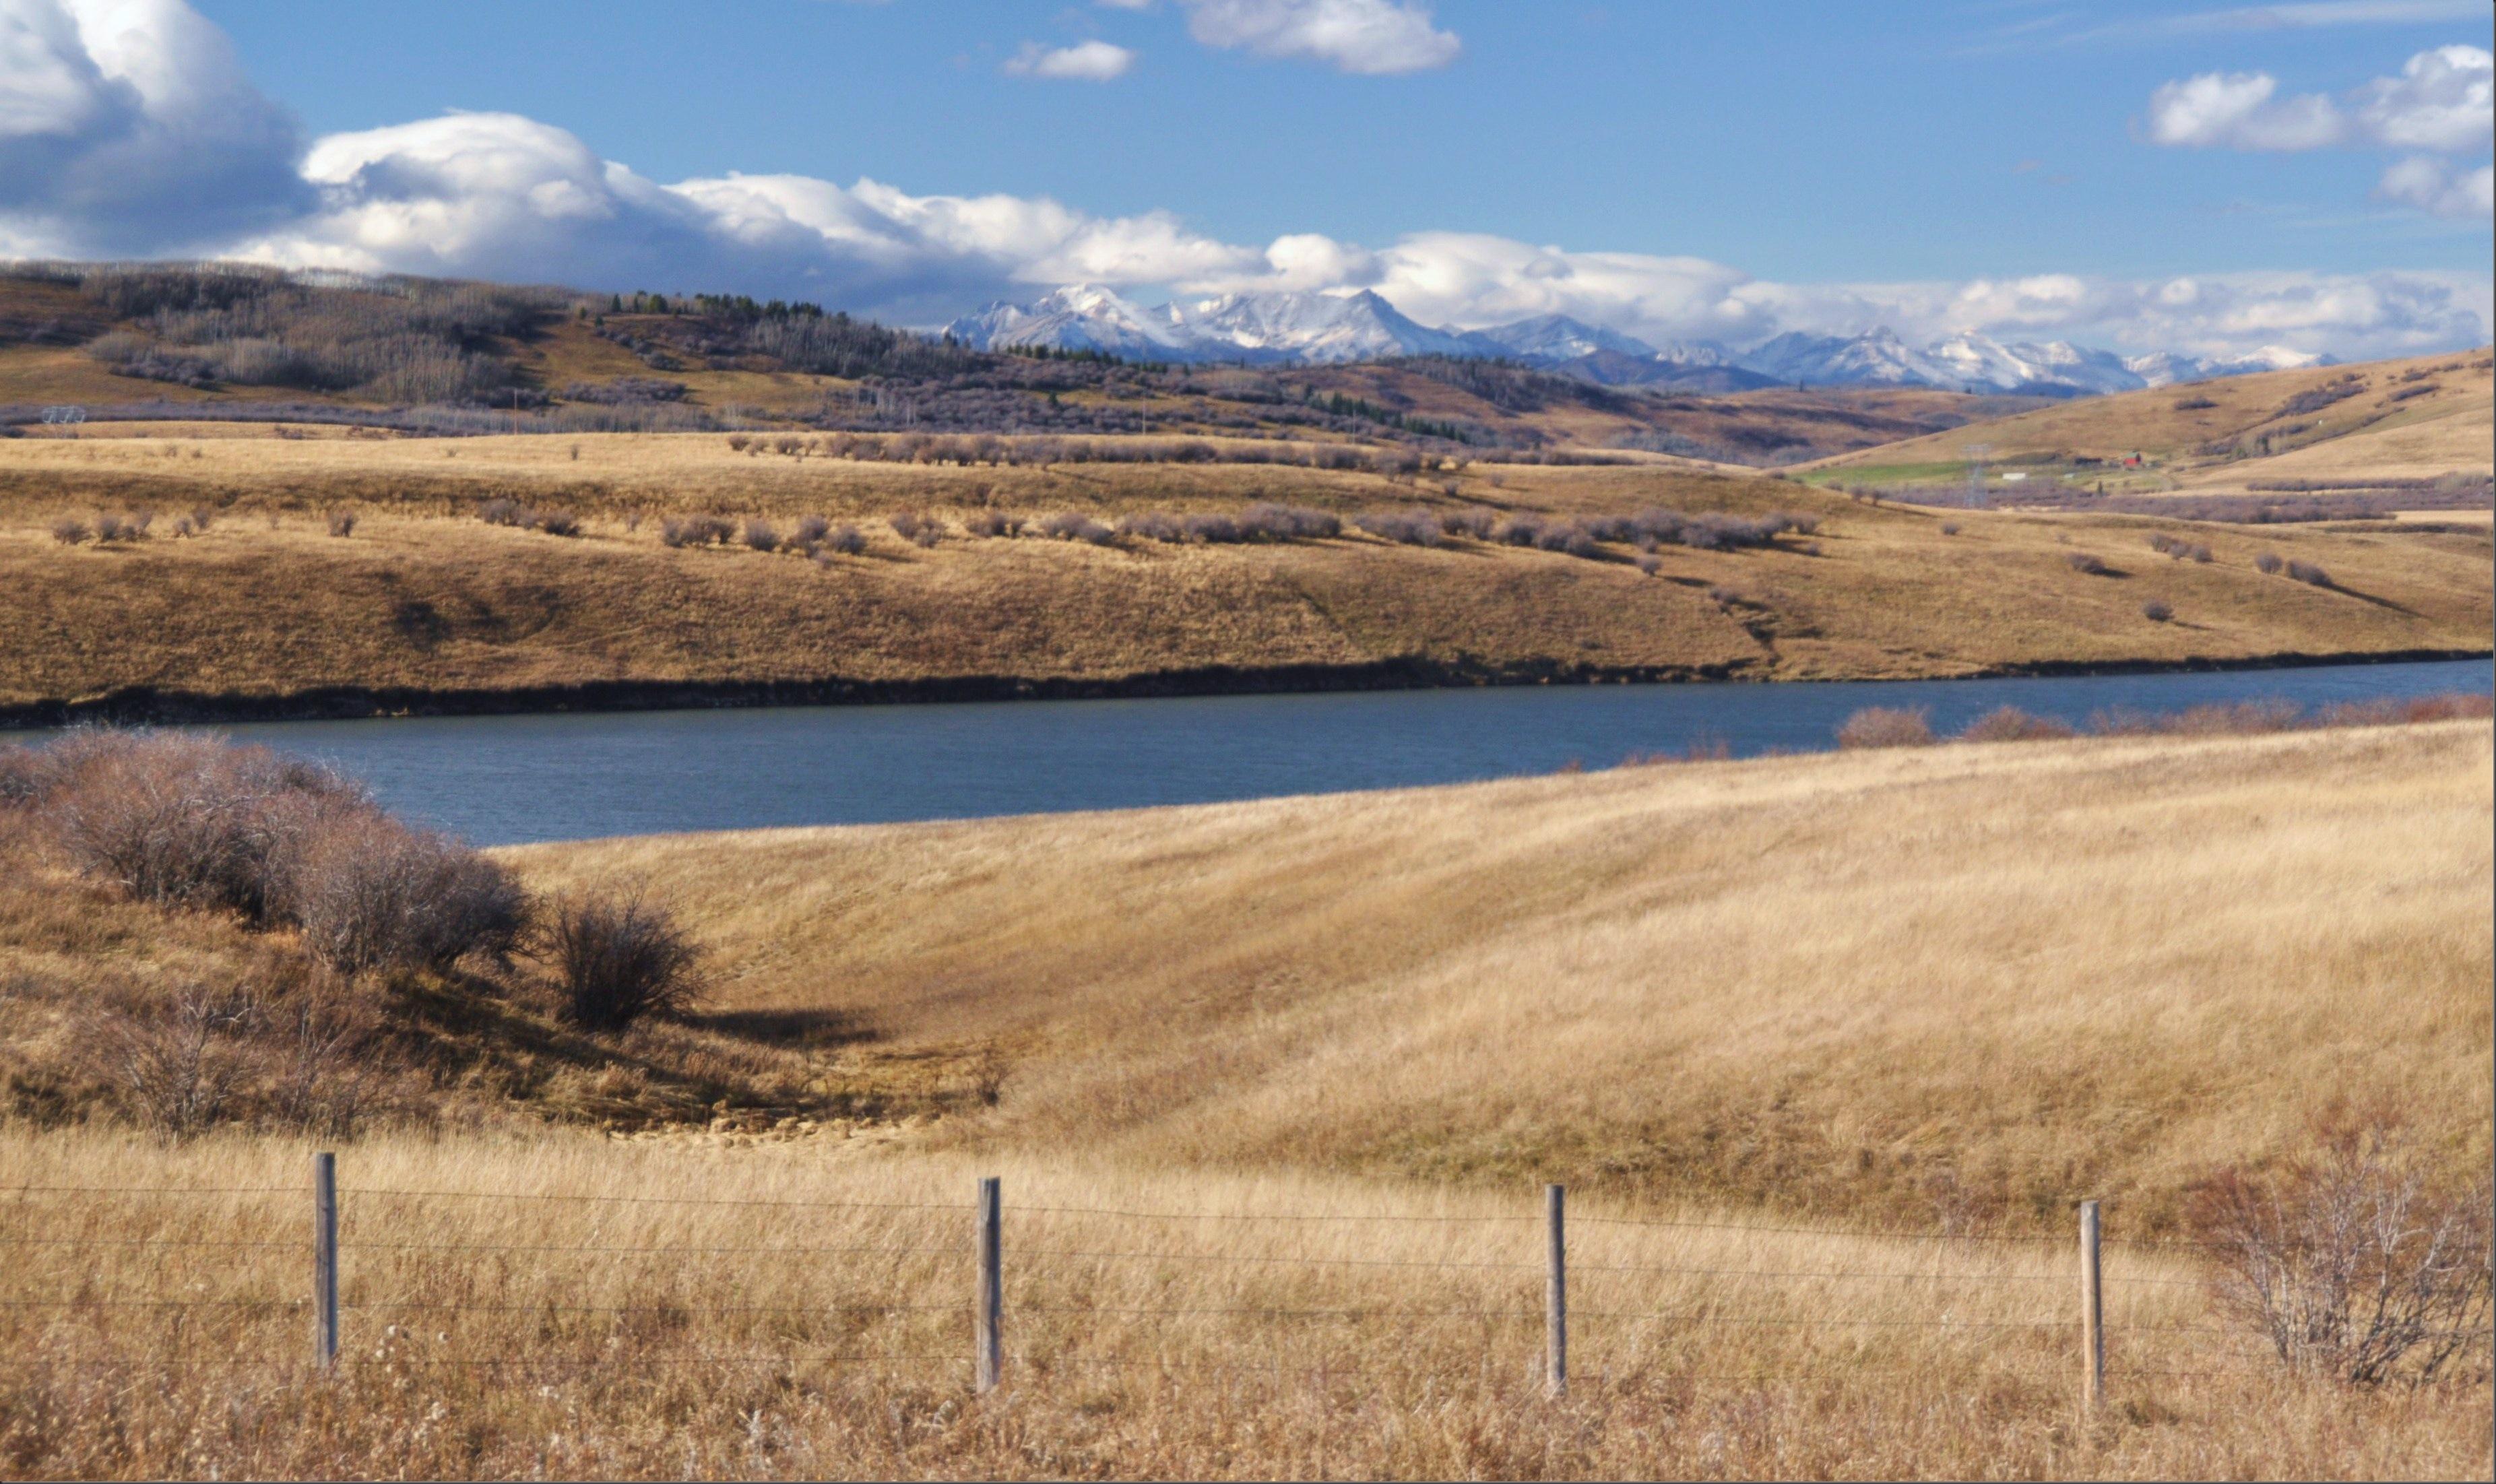 Foothills of Alberta - Bruce Witzel photo